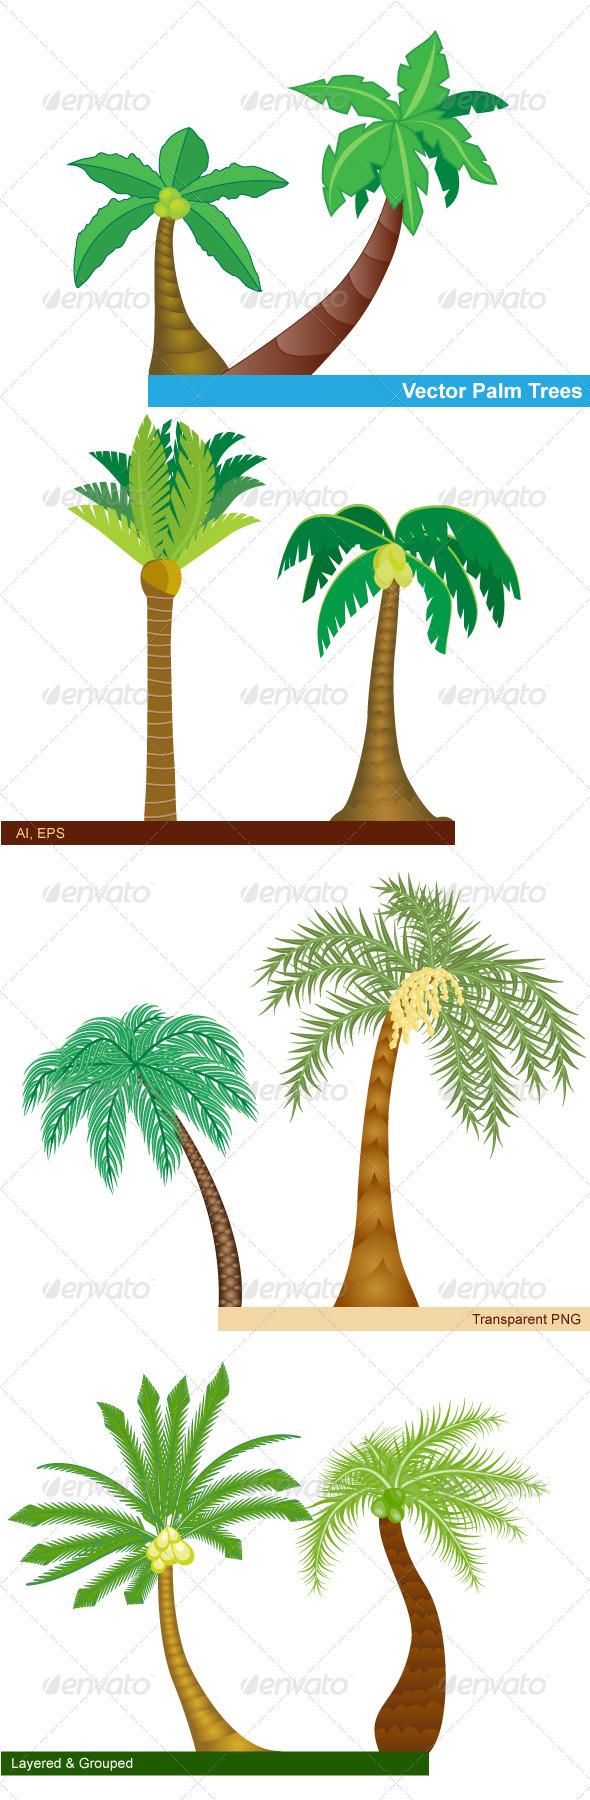 GraphicRiver Palm Trees 8018529